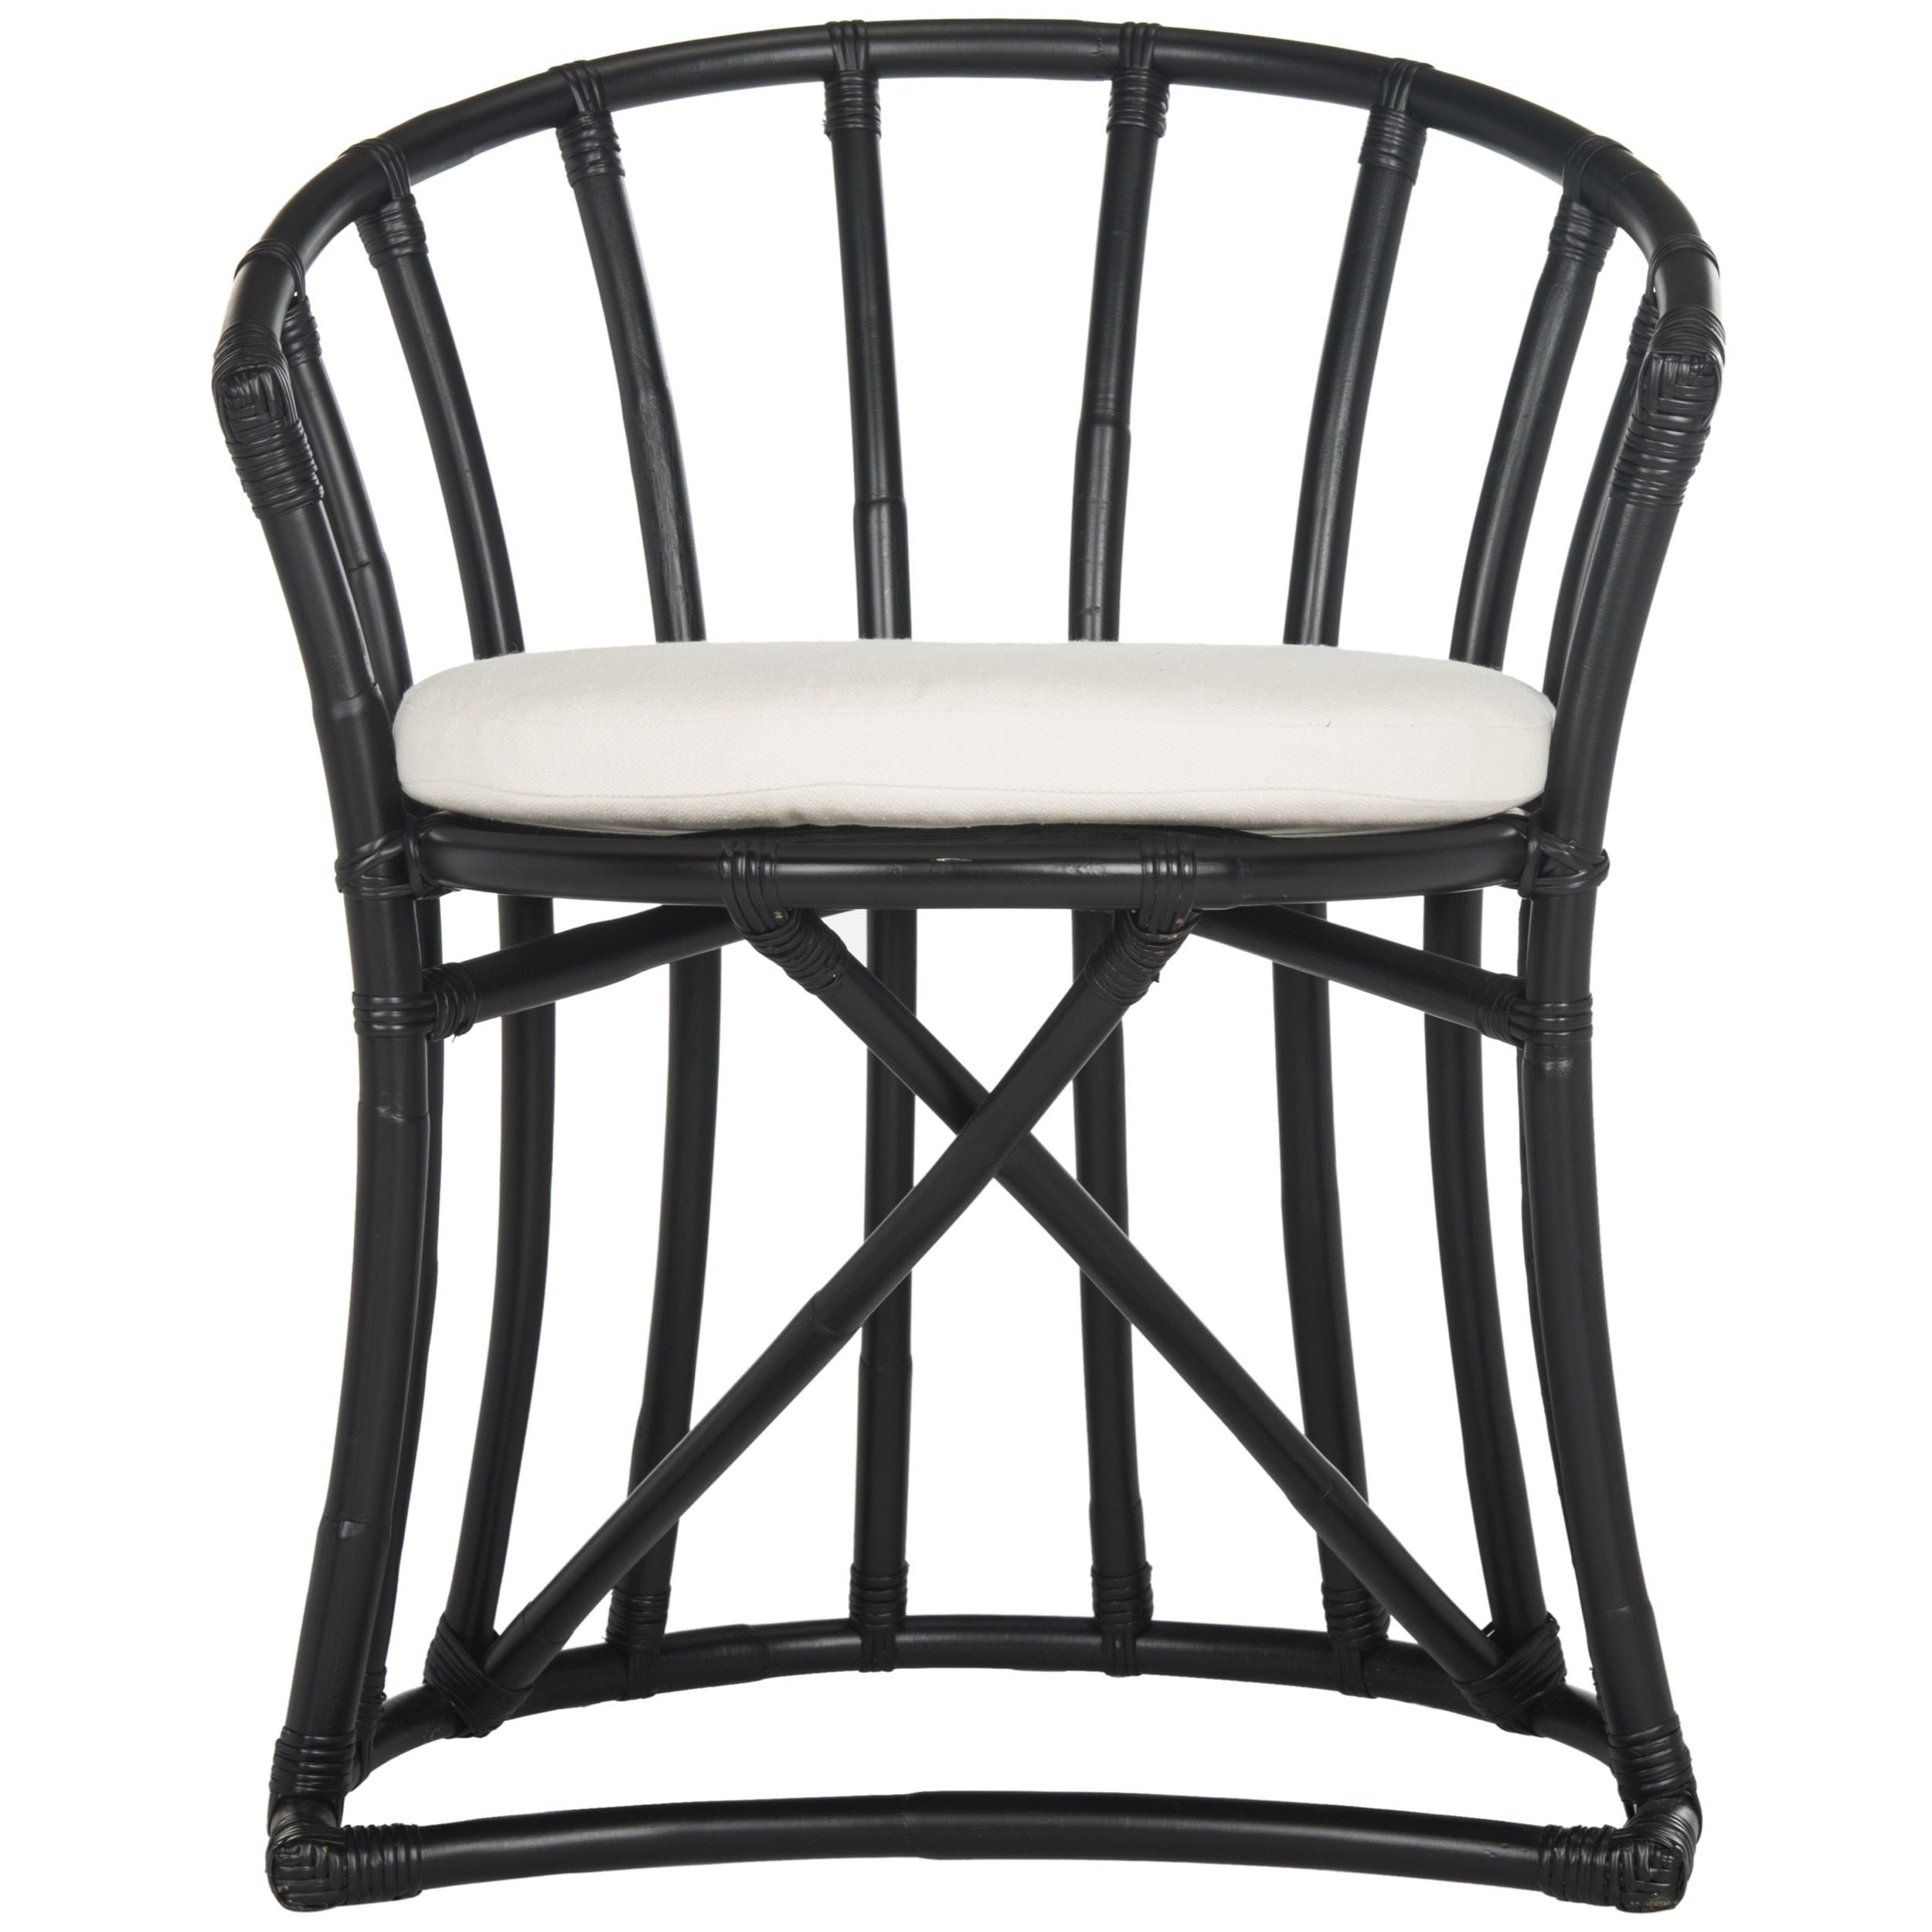 Safavieh Bates Rattan Accent Chair Wik6500a Black In 2019